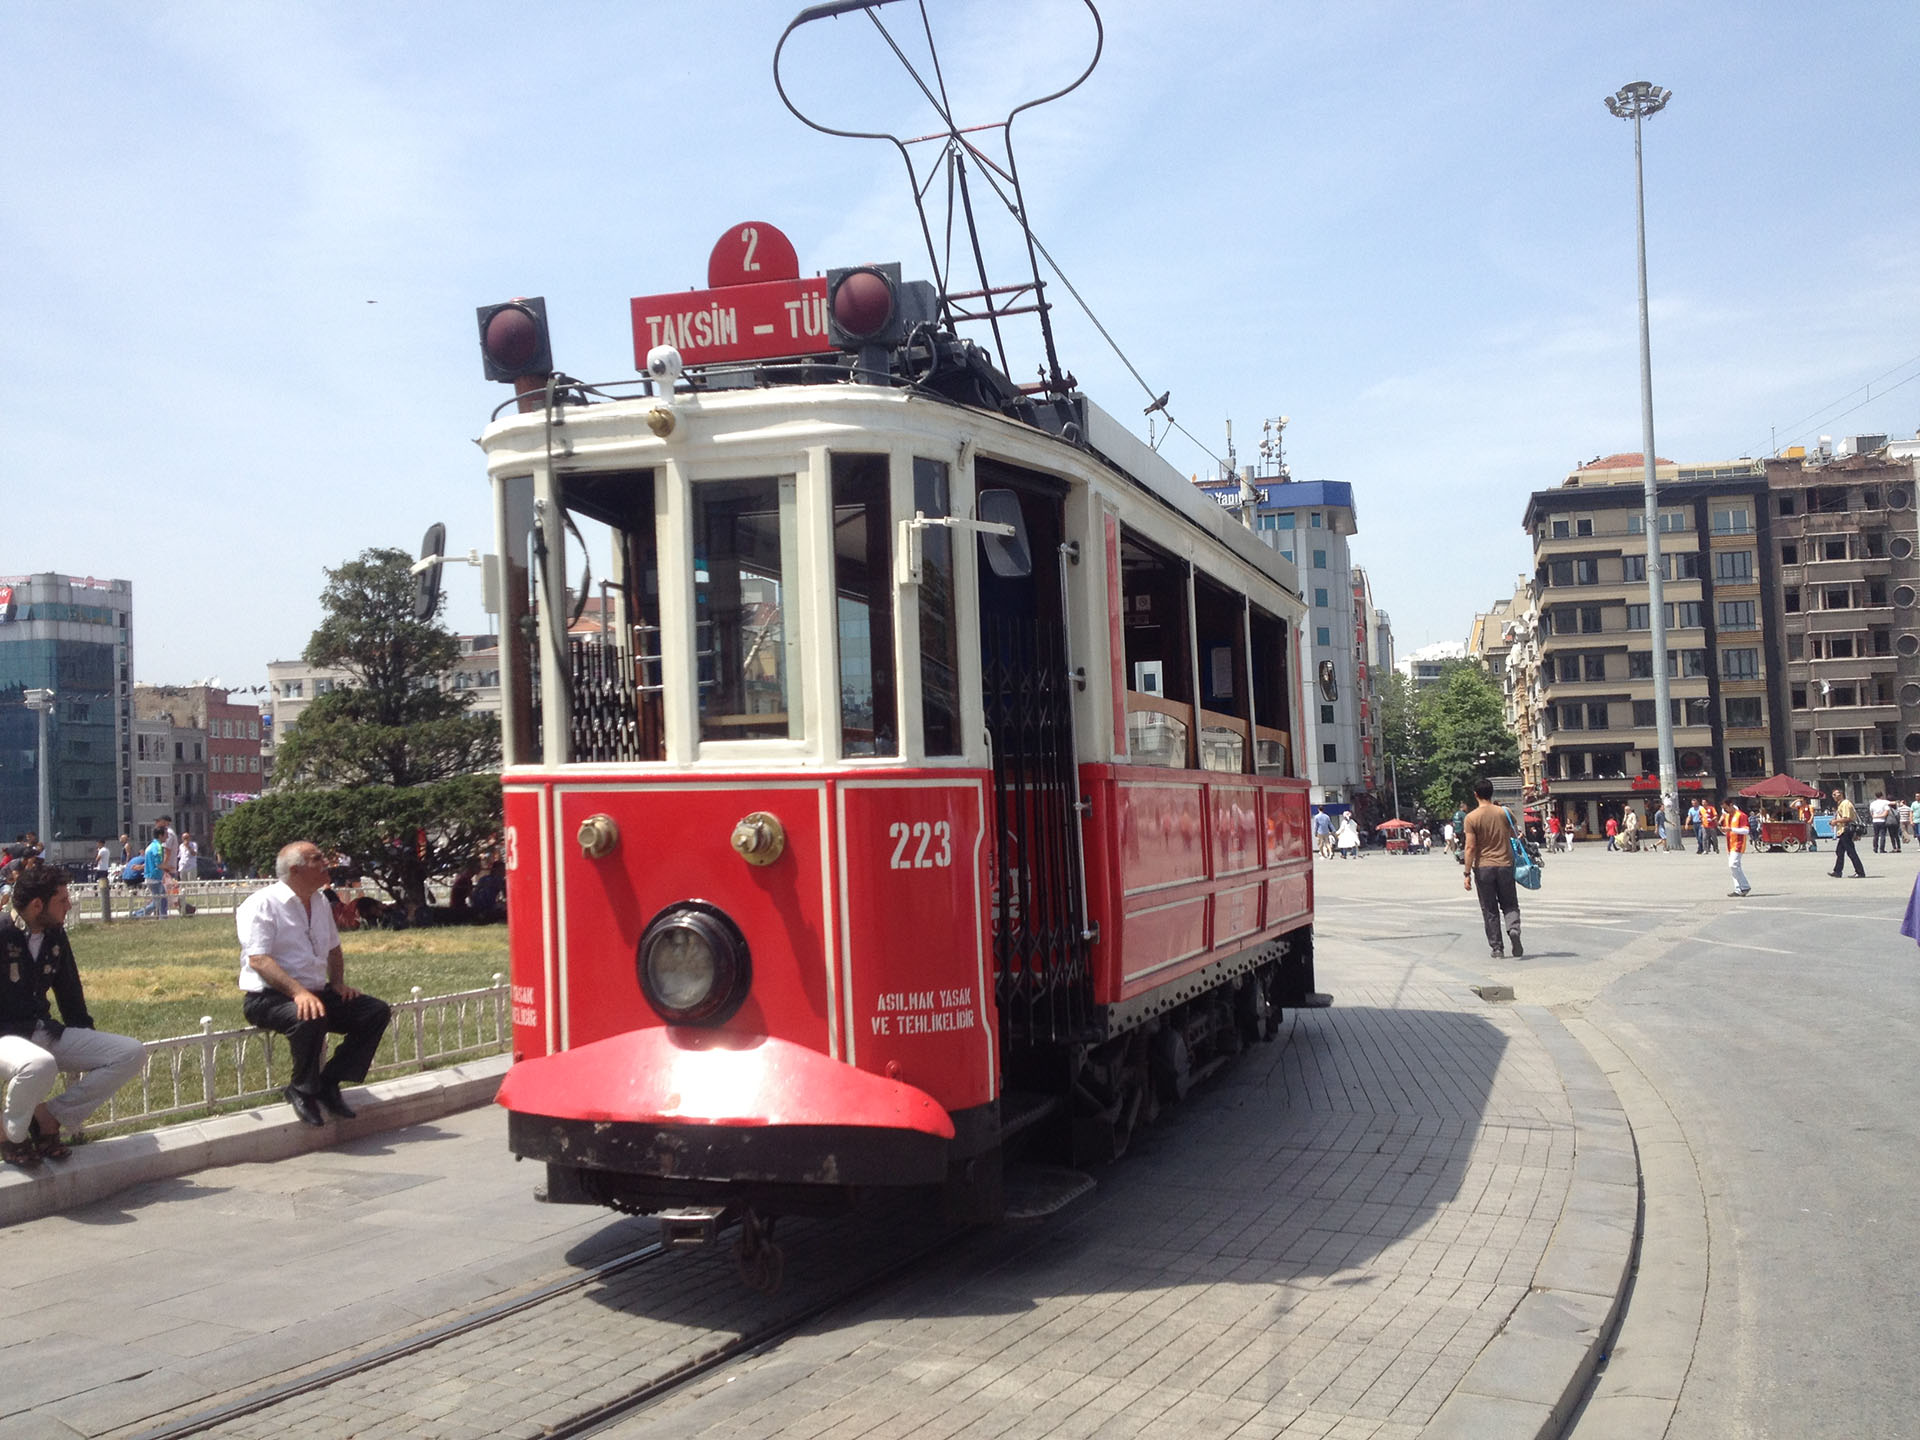 Istanbul, Turkey, Tramway Taksim Place